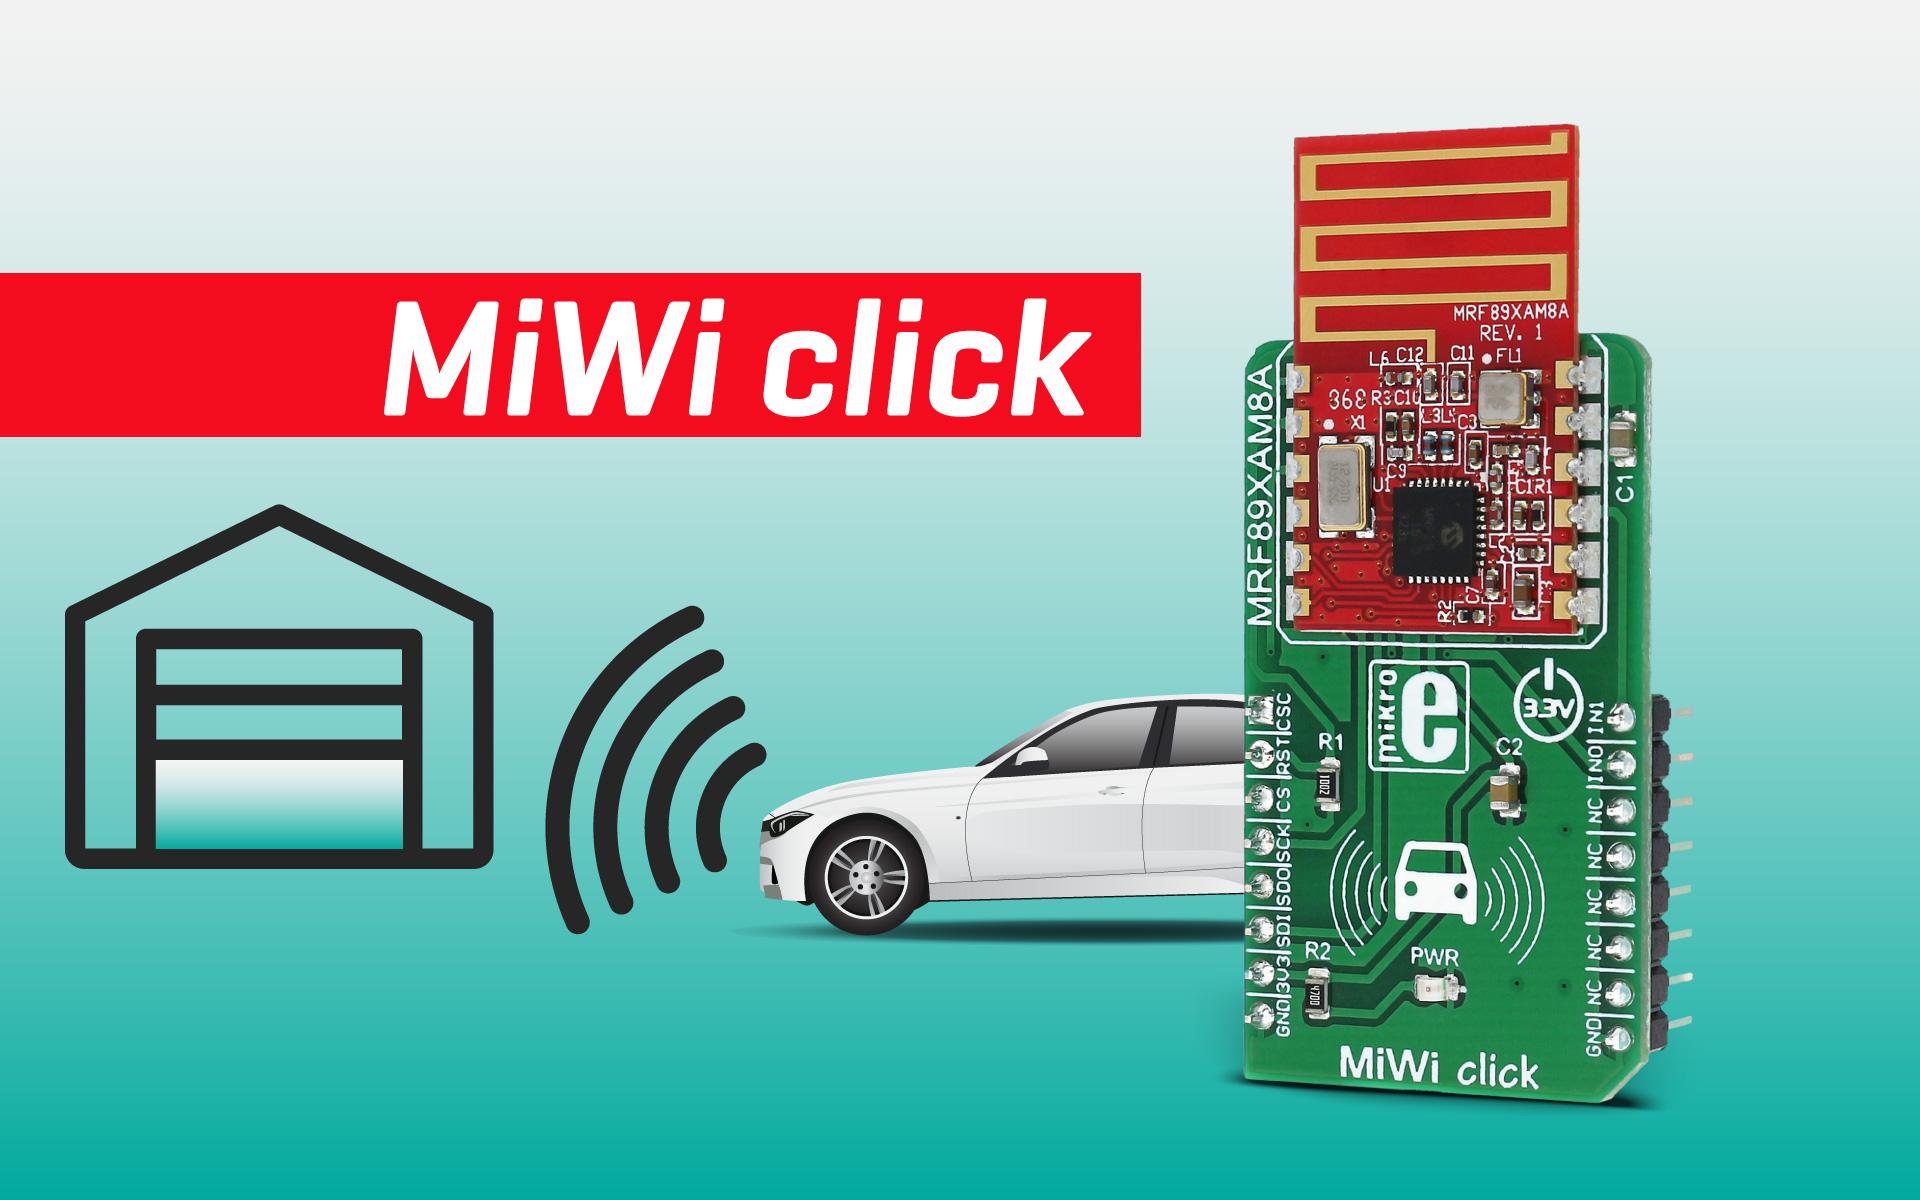 MiWi click - a sub-gigahertz radio transceiver